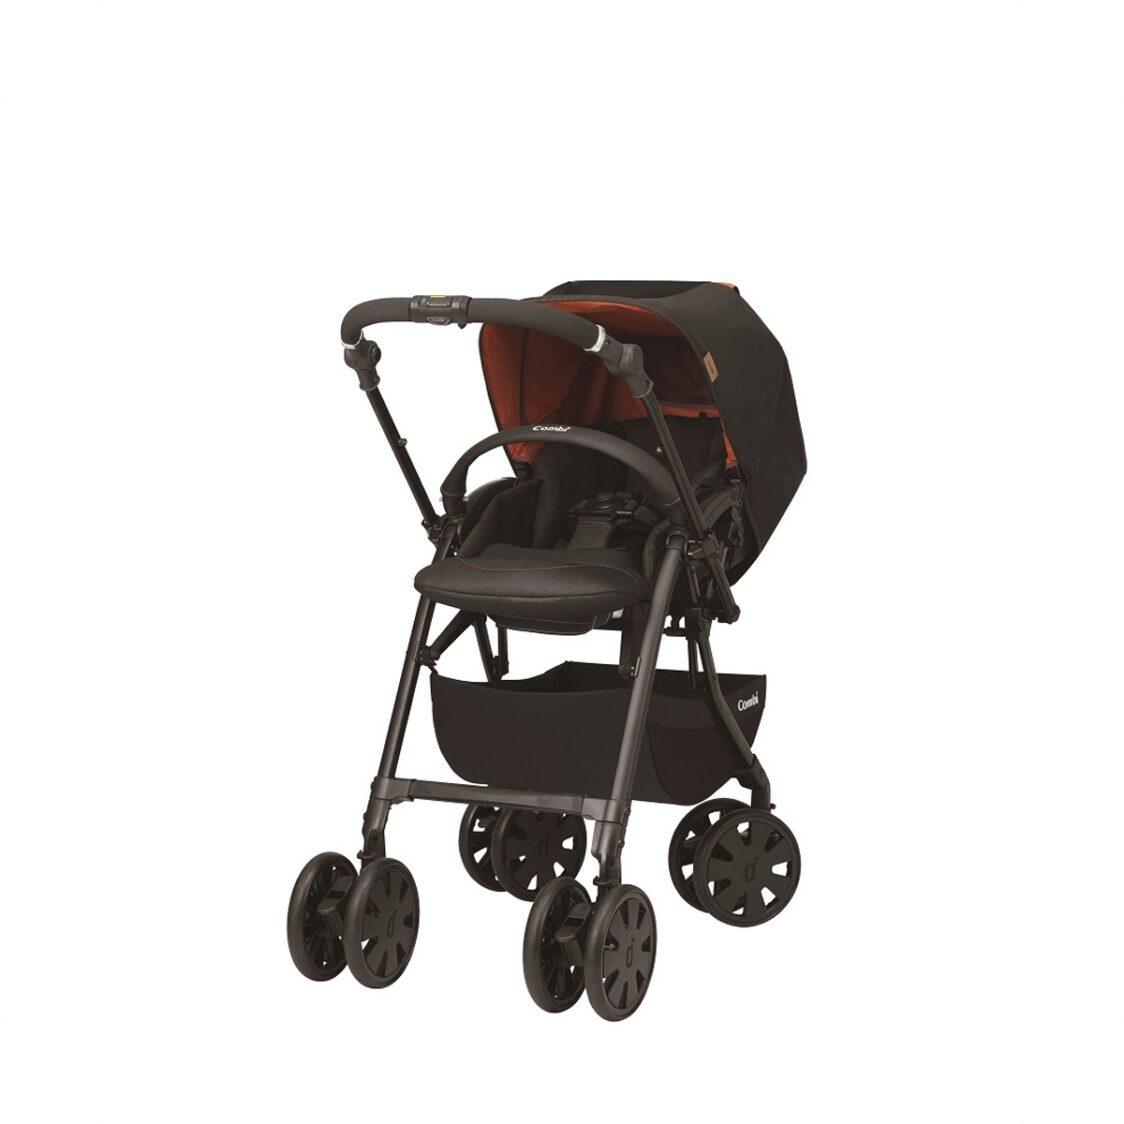 Combi Crossgo Tangerine Black Stroller 136 Months 67KG Auto 4 Swivel wheels